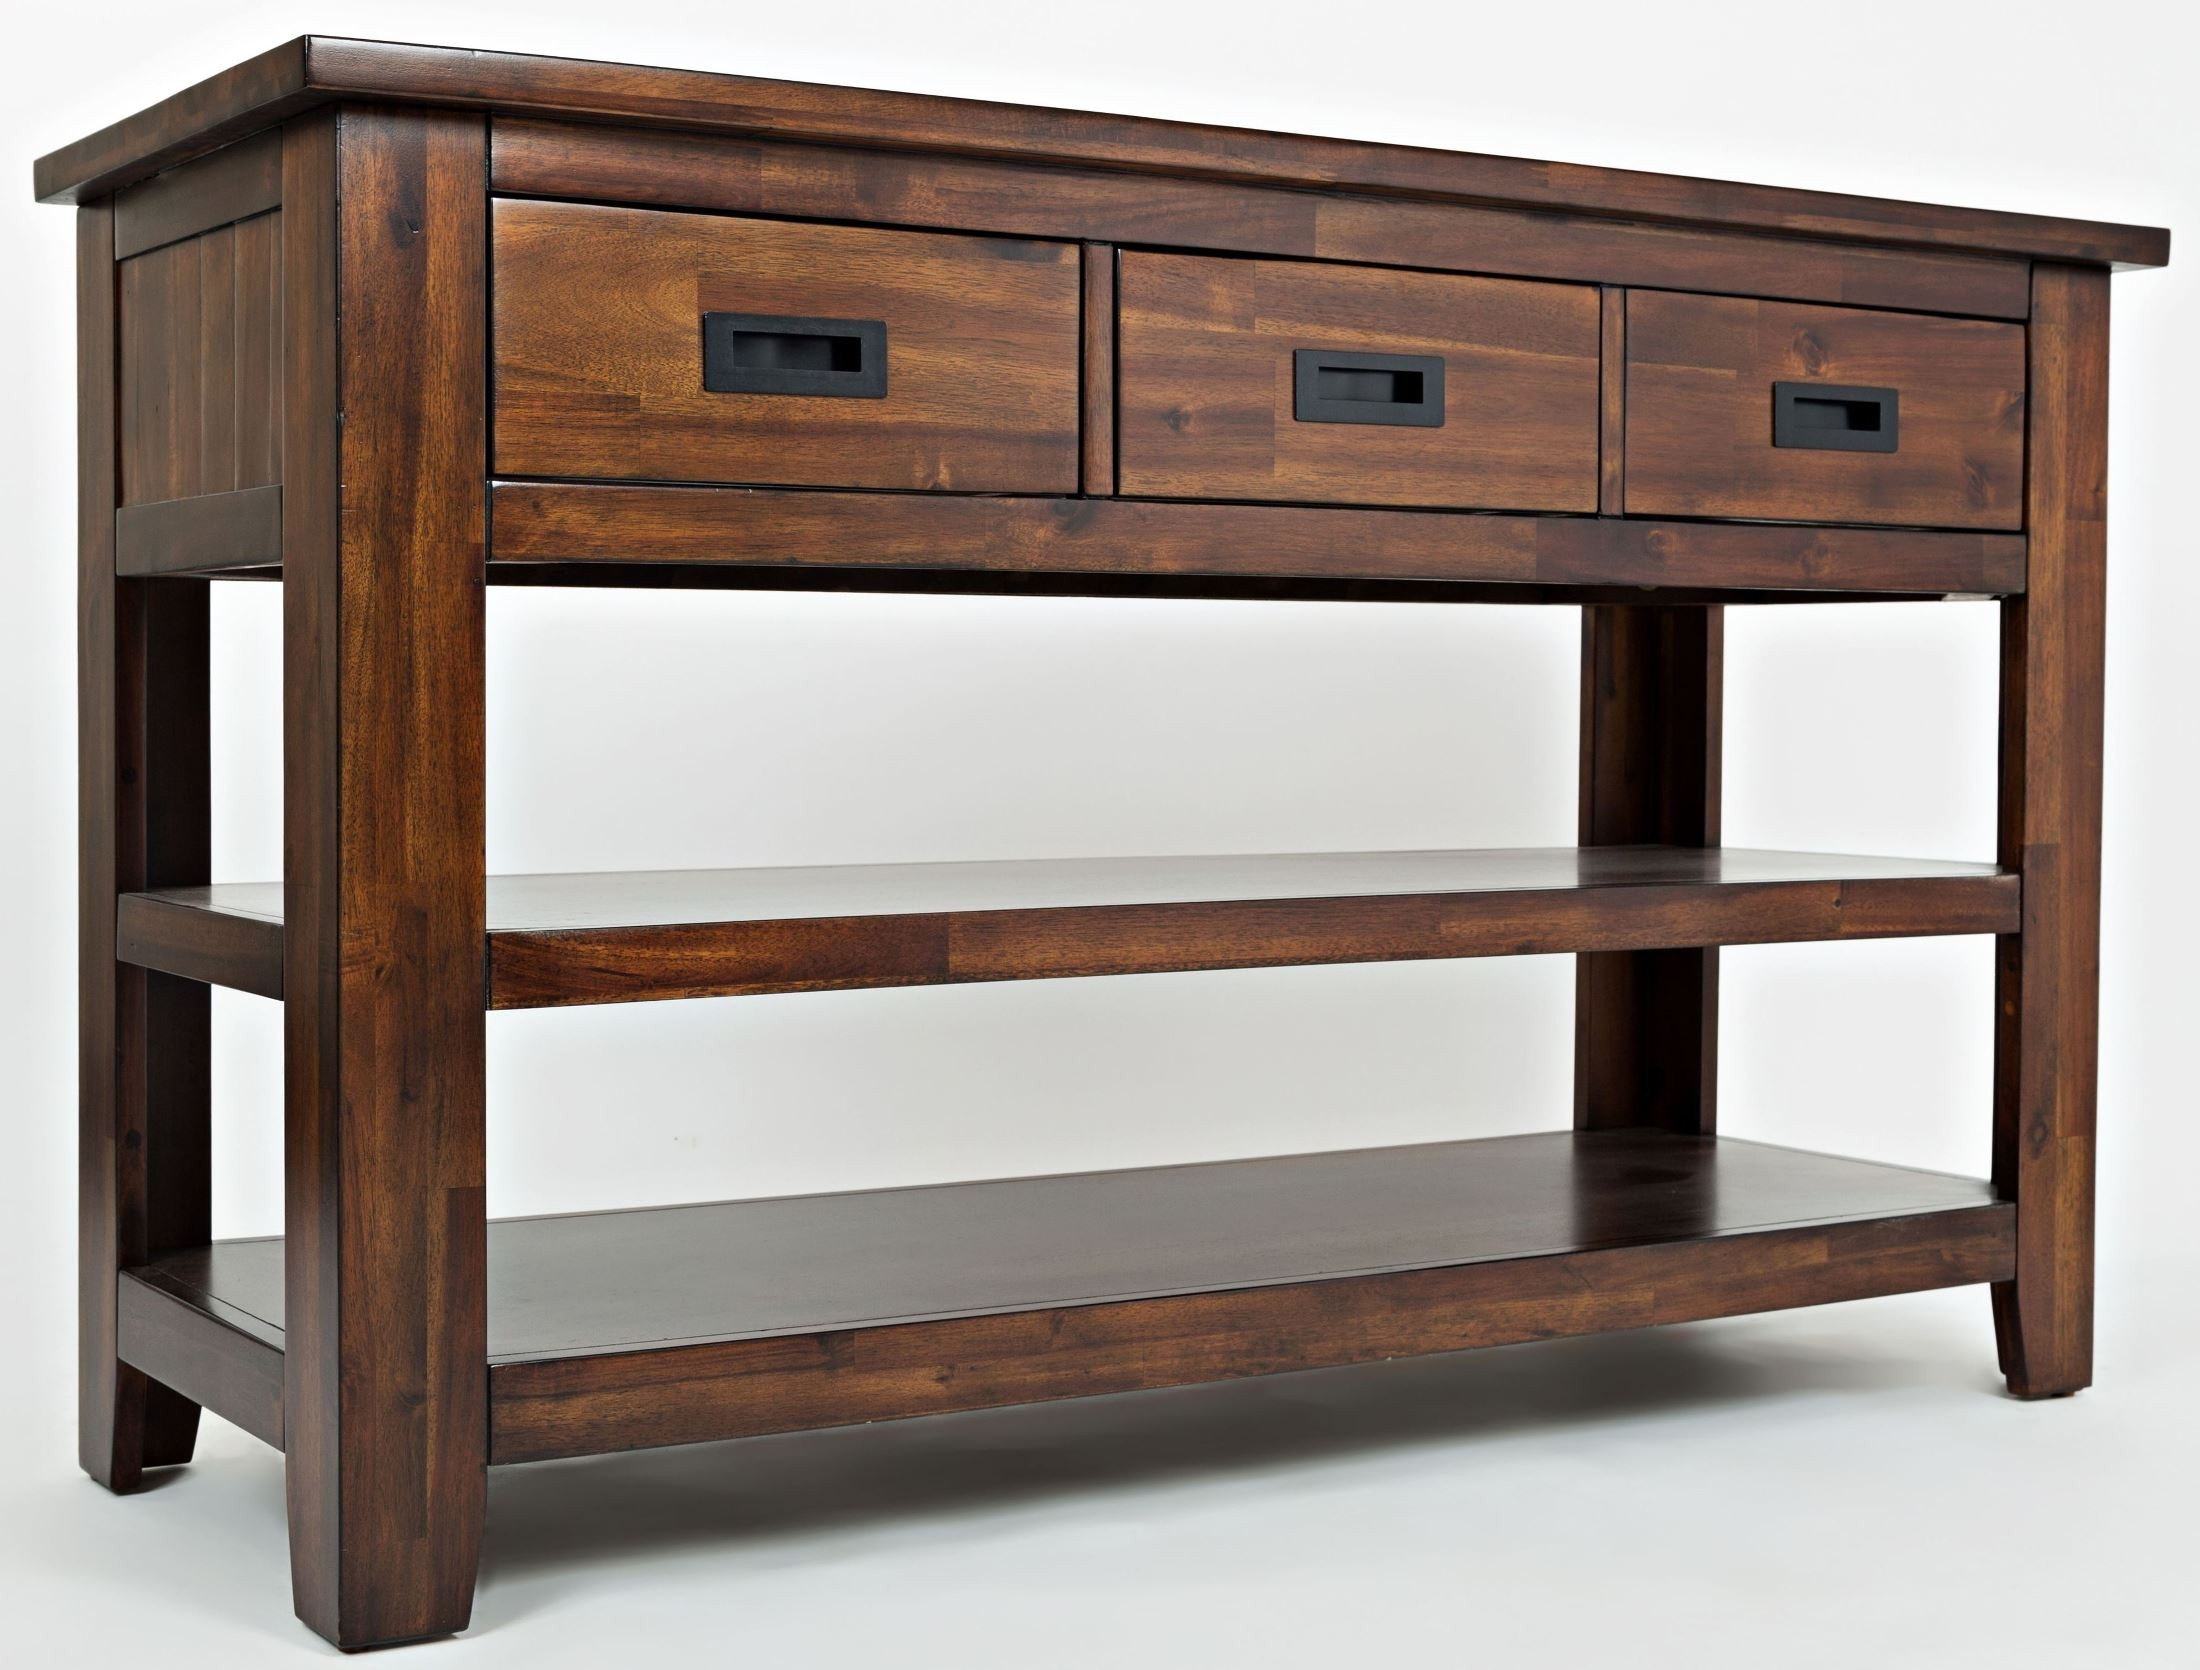 Coolidge corner sofa media table 1500 4 jofran - Table console brookline ...